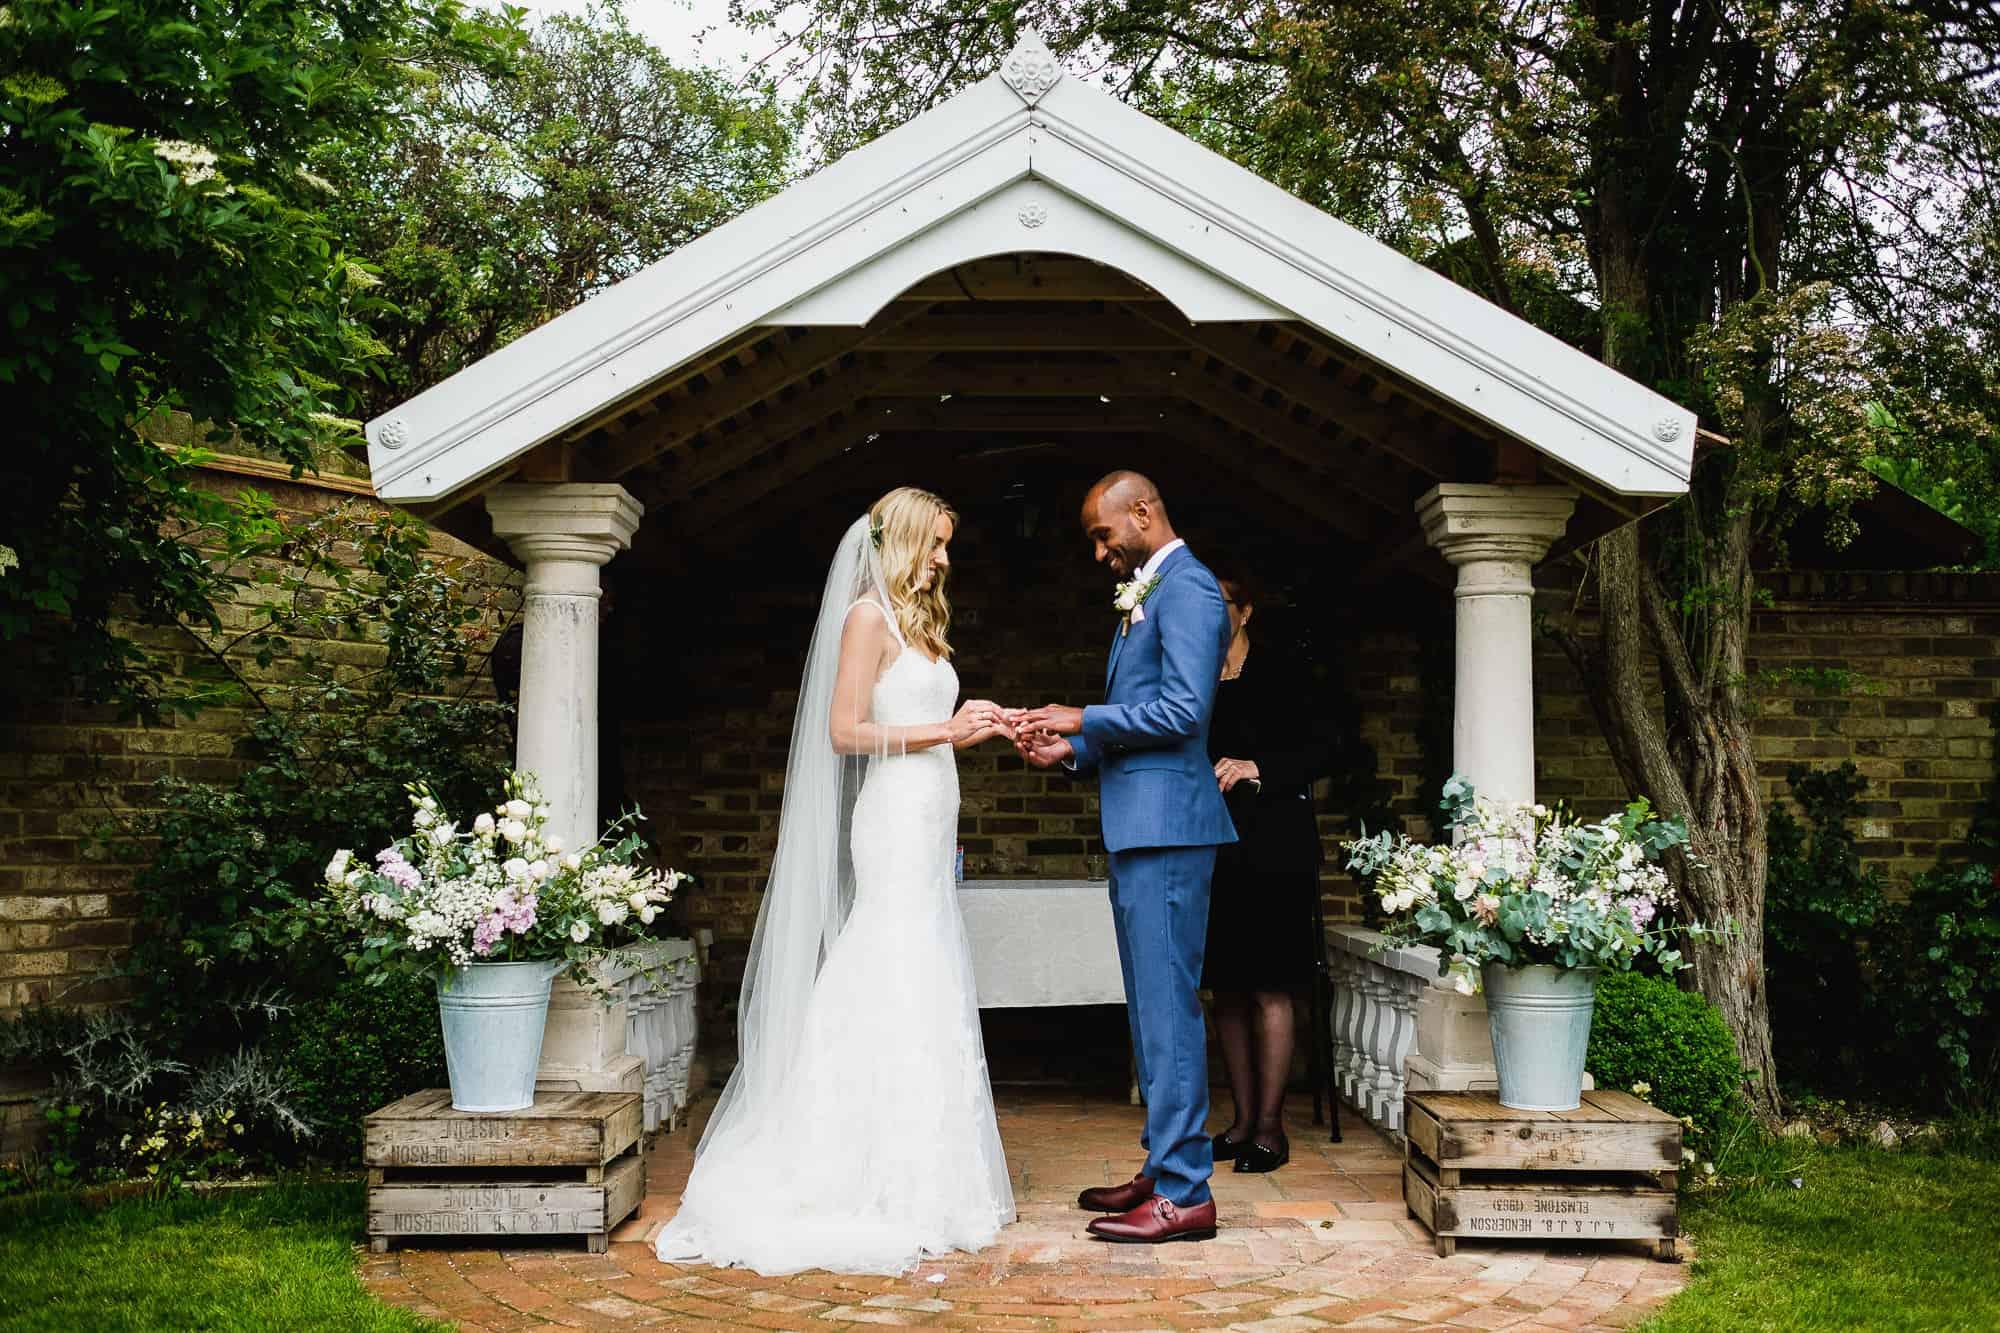 marleybrook-house-wedding-photography-matt-tyler-0028